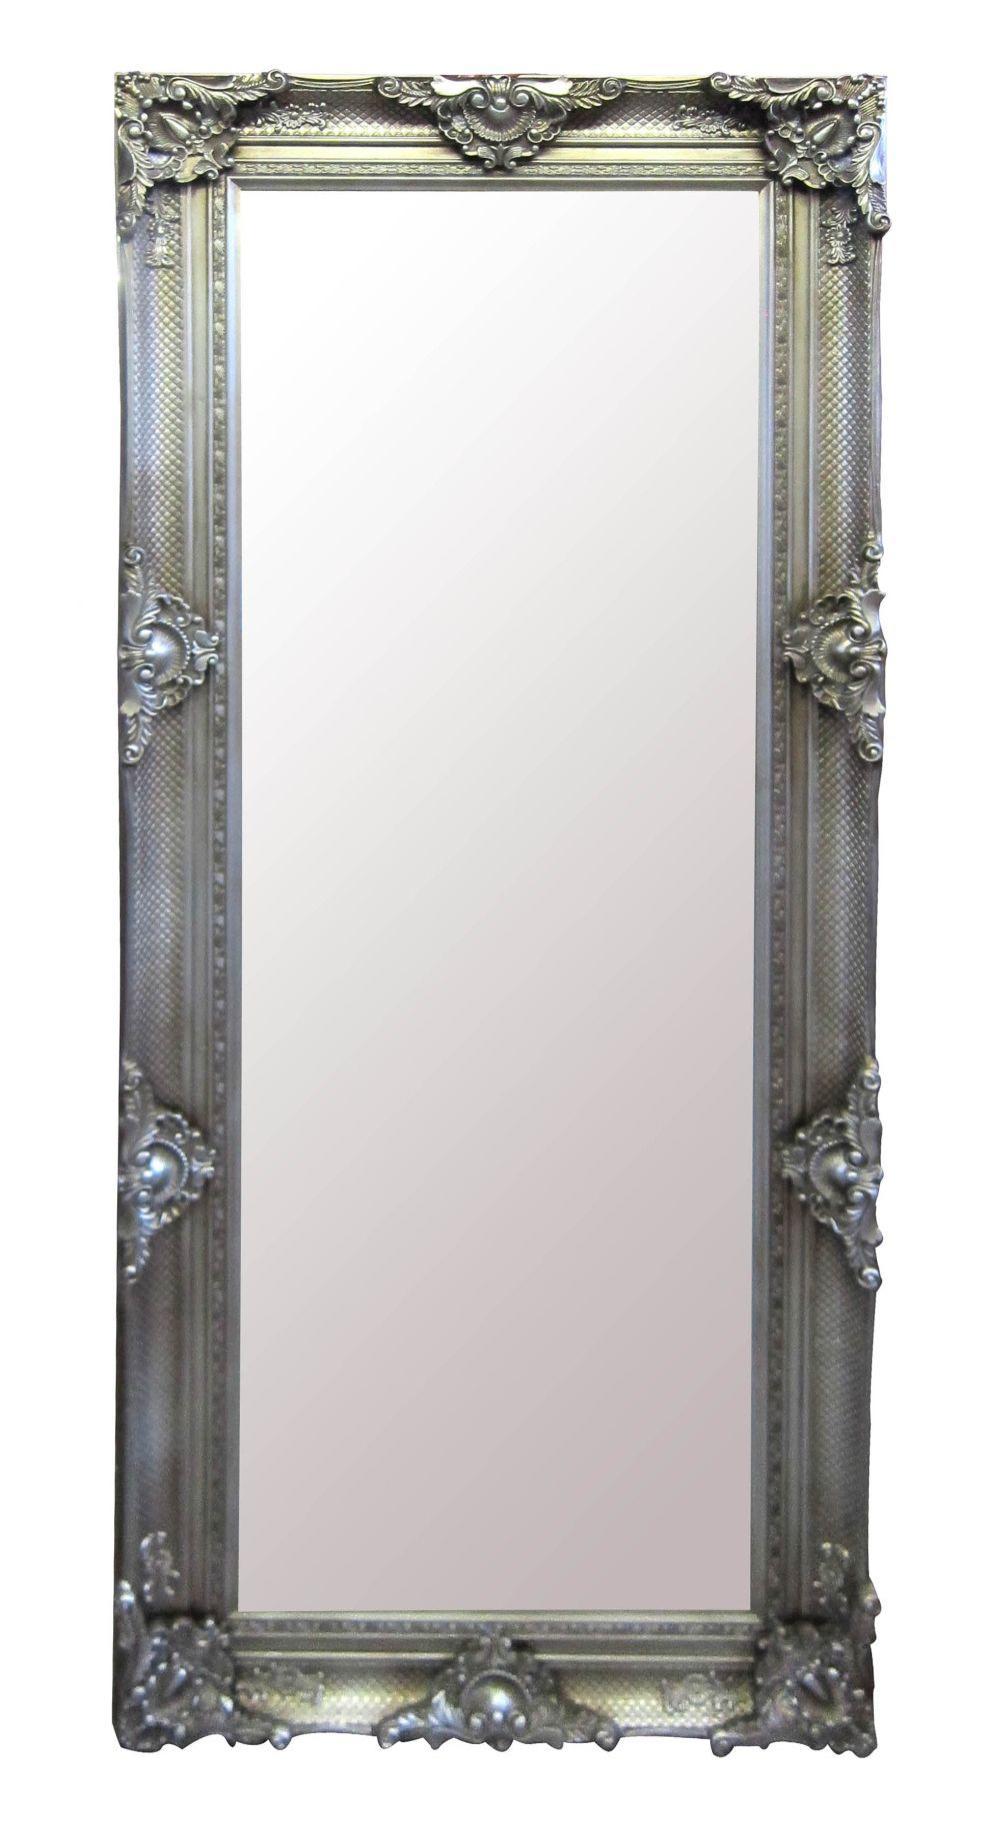 Wood-framed mirror